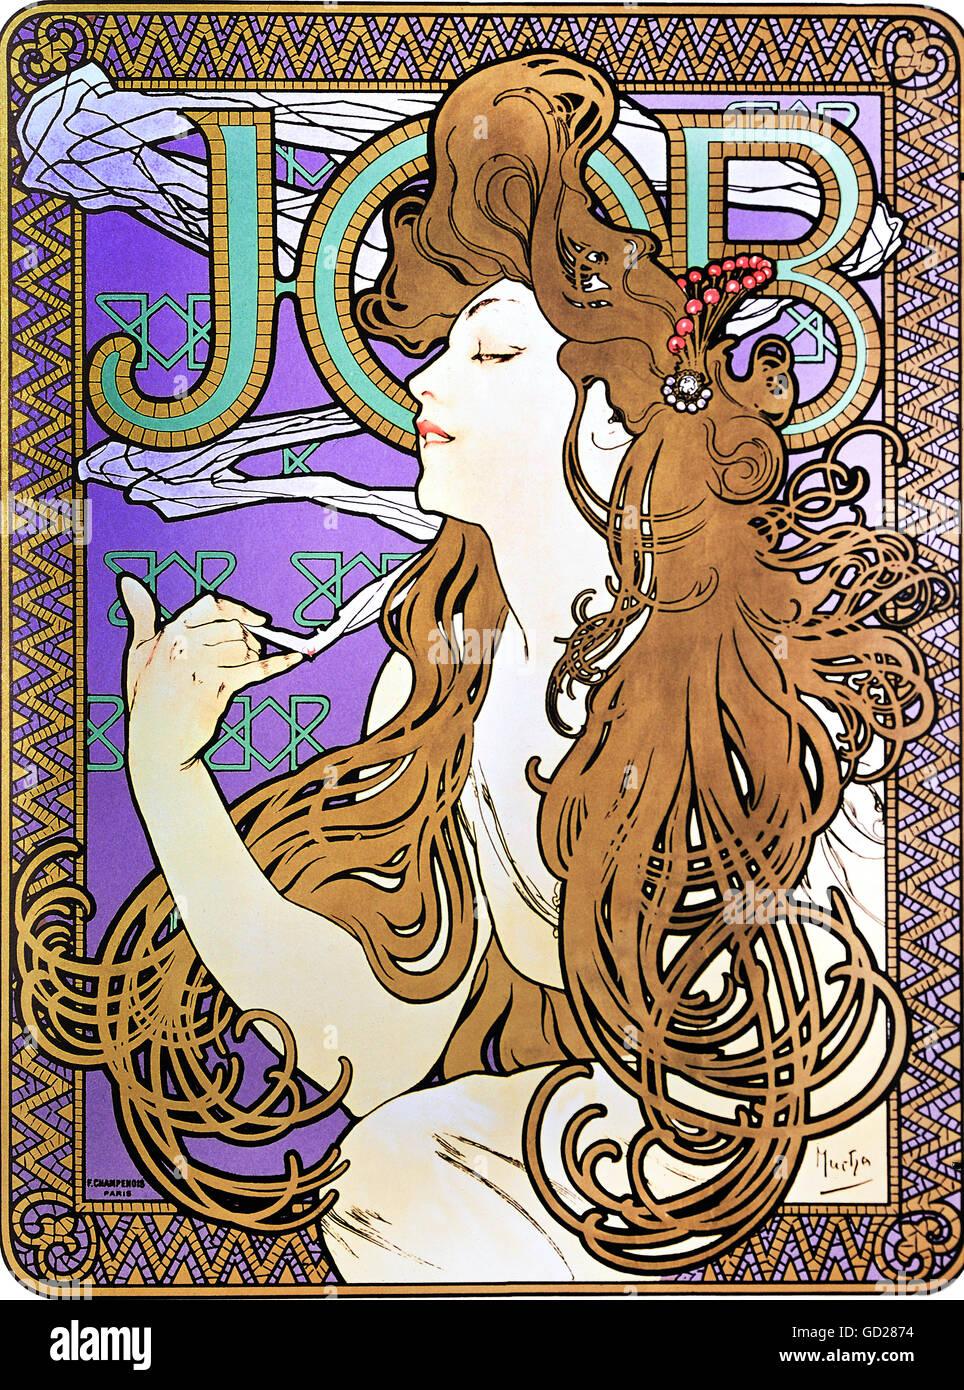 "fine arts, Mucha, Alphonse (1860 - 1939), poster, advertising poster for ""Job"" cigarettes, colour lithograph, Paris, Stock Photo"